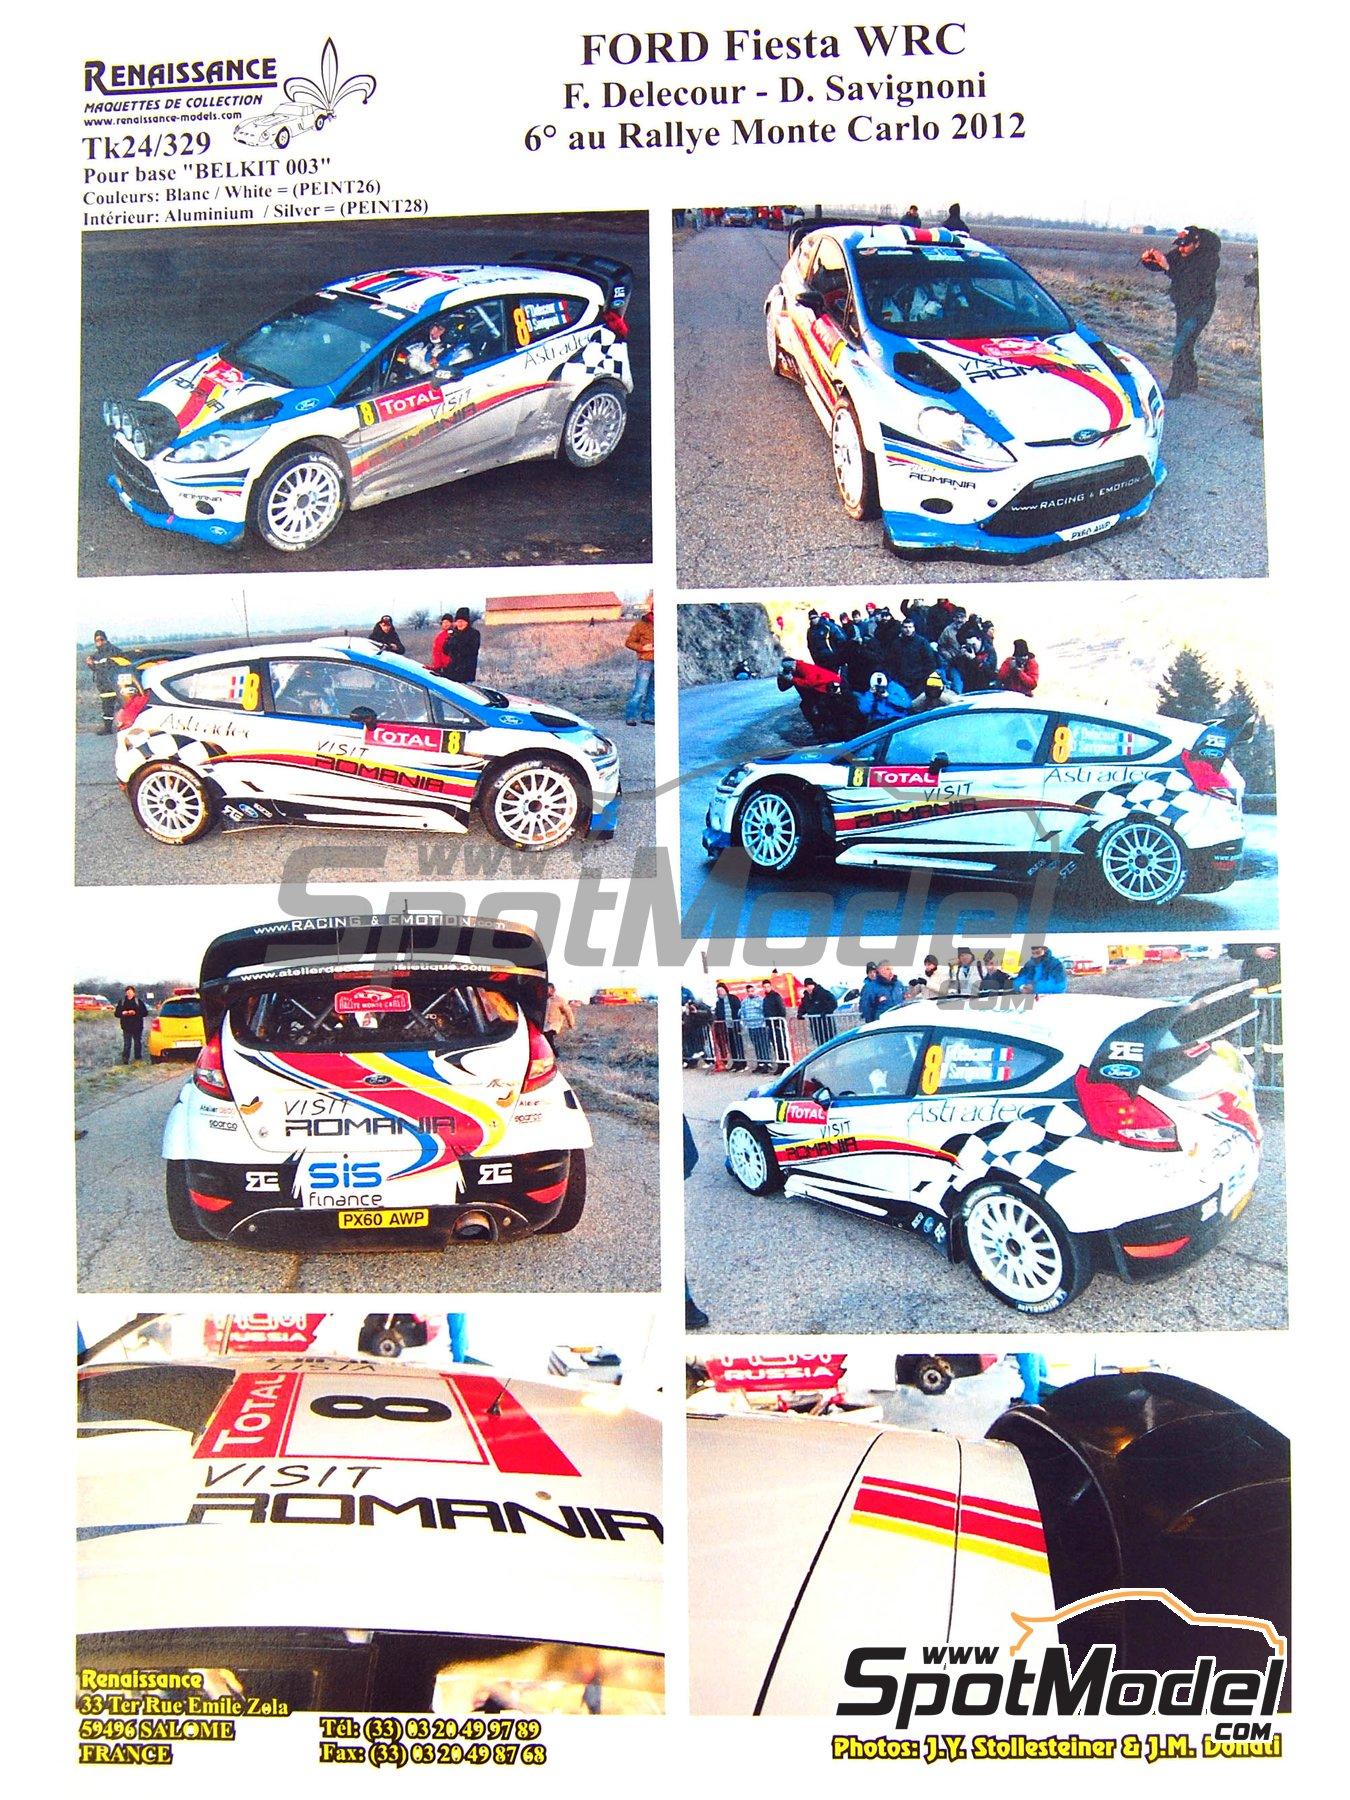 Ford Fiesta WRC Romania - Rally de Montecarlo 2012 | Calcas de agua en escala1/24 fabricado por Renaissance Models (ref.TK24-329) image